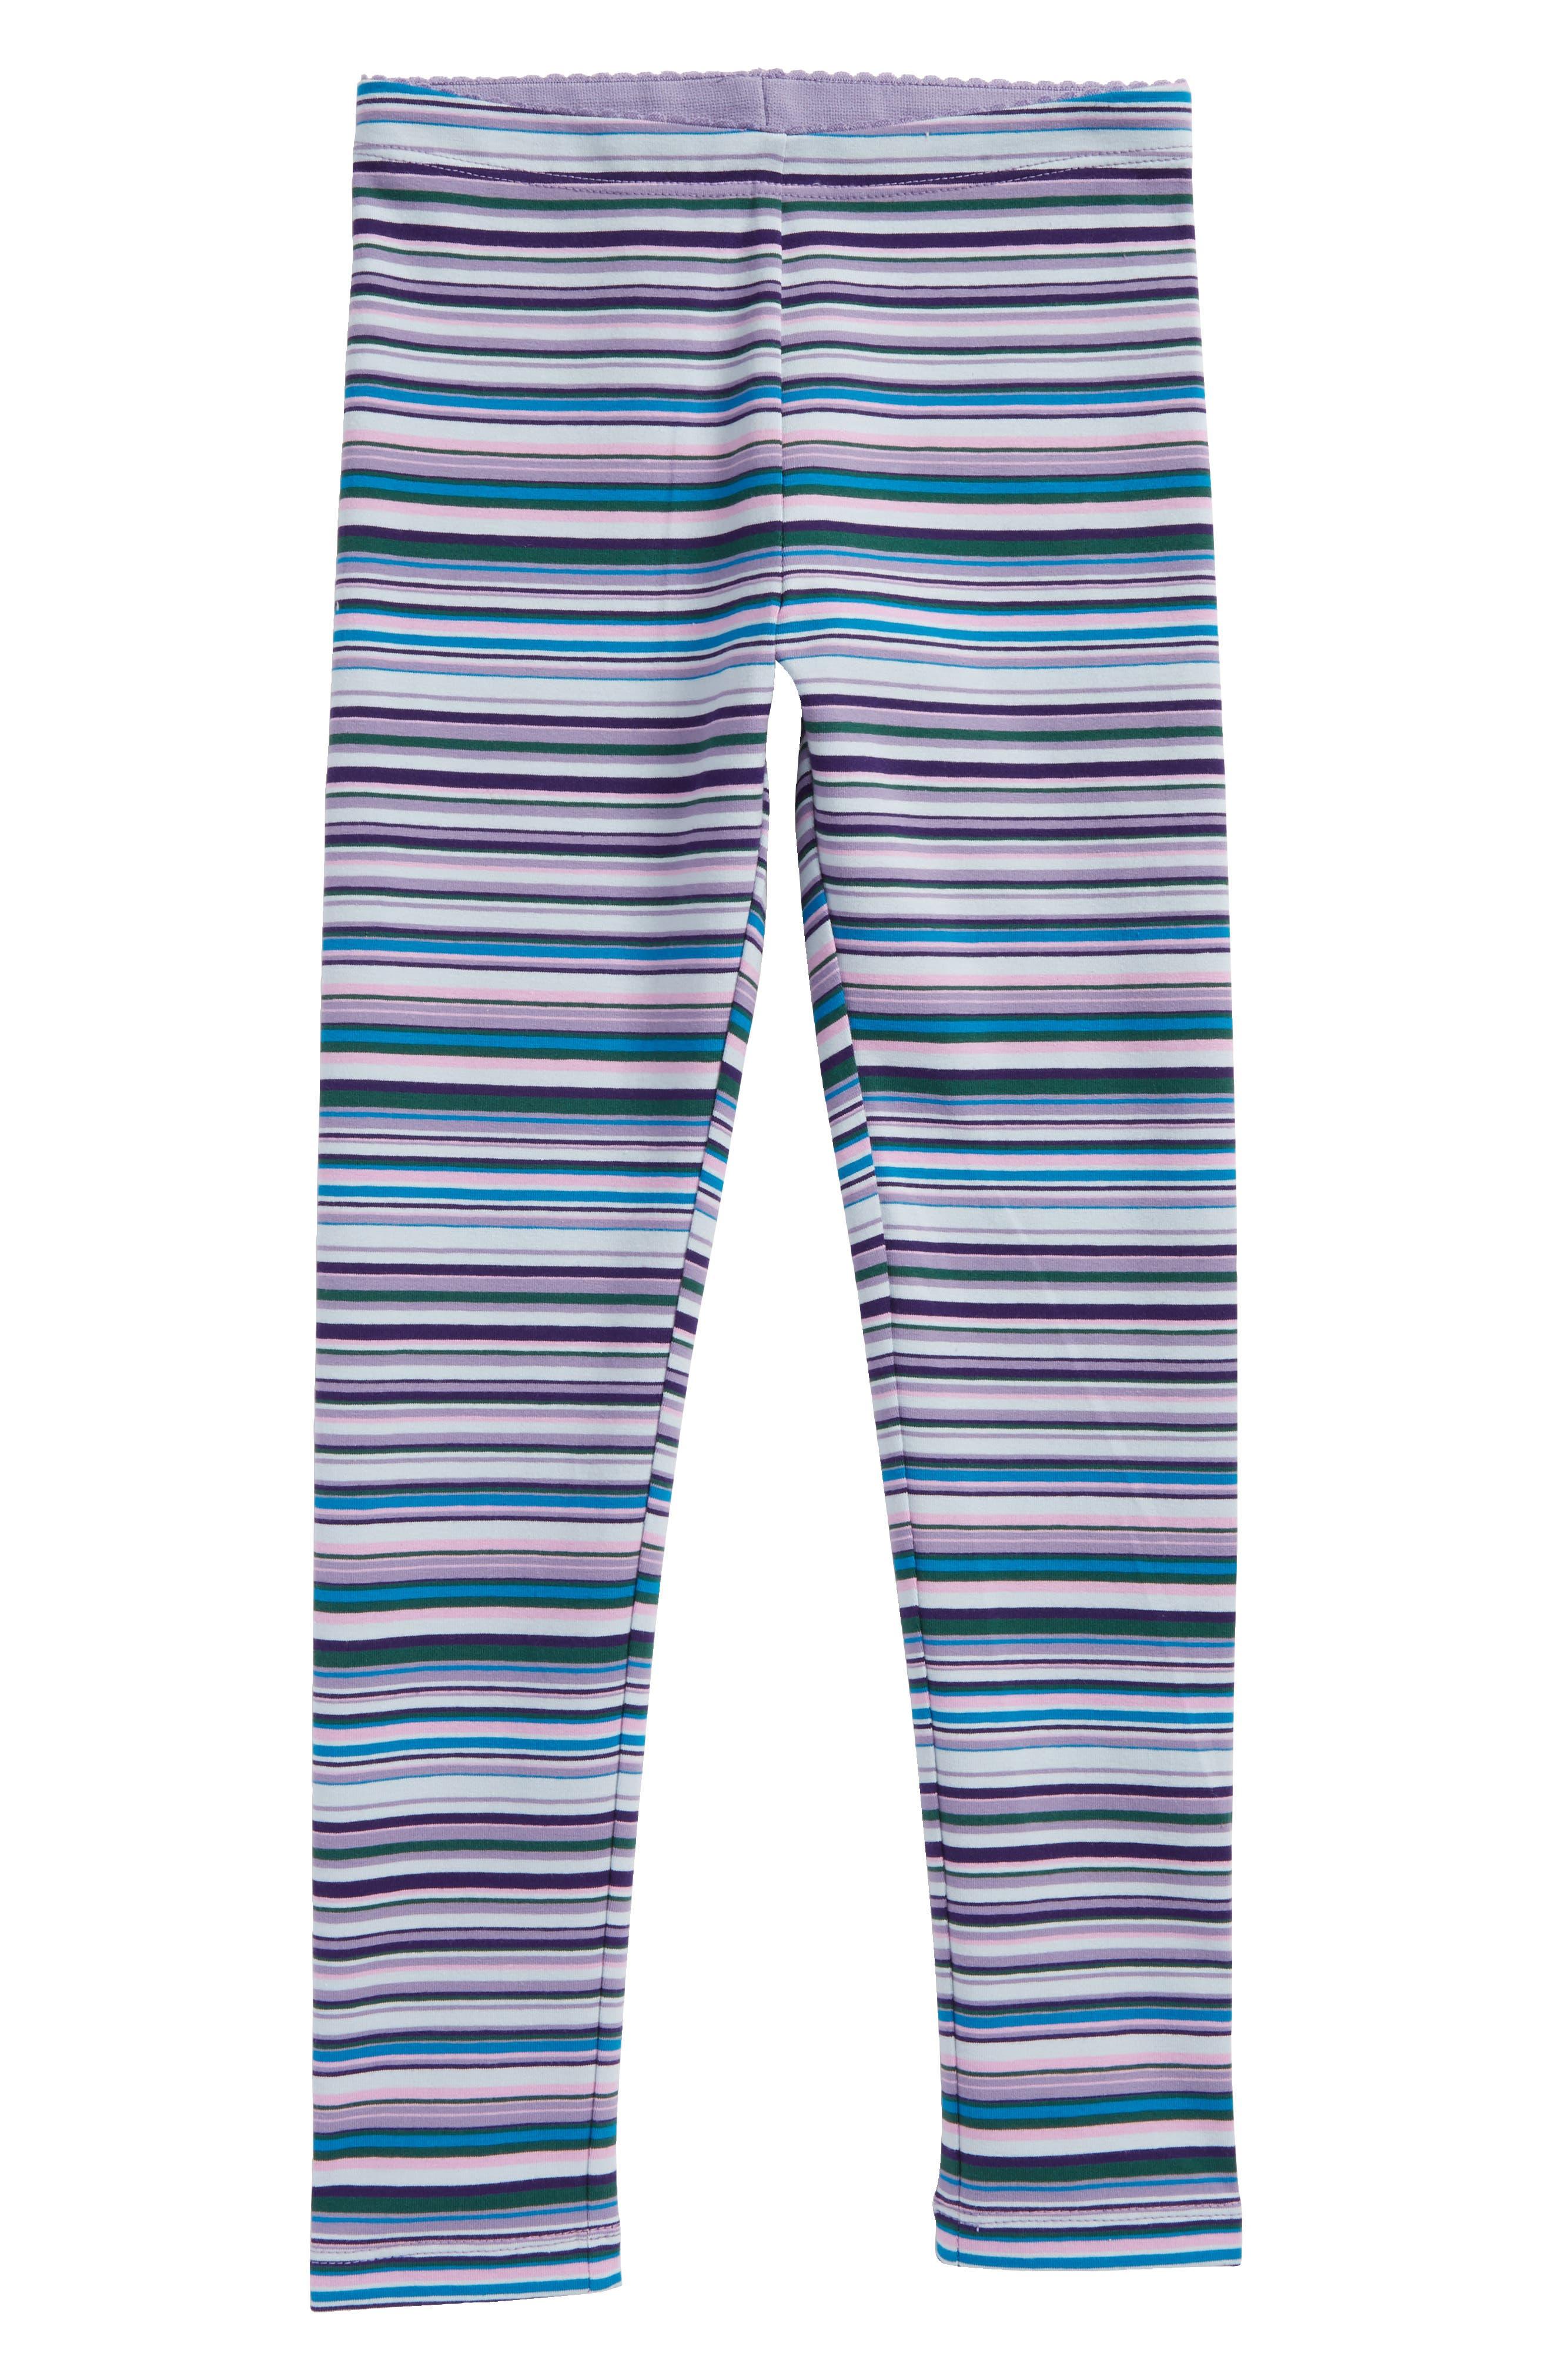 Multistripe Leggings,                             Main thumbnail 1, color,                             Taffy